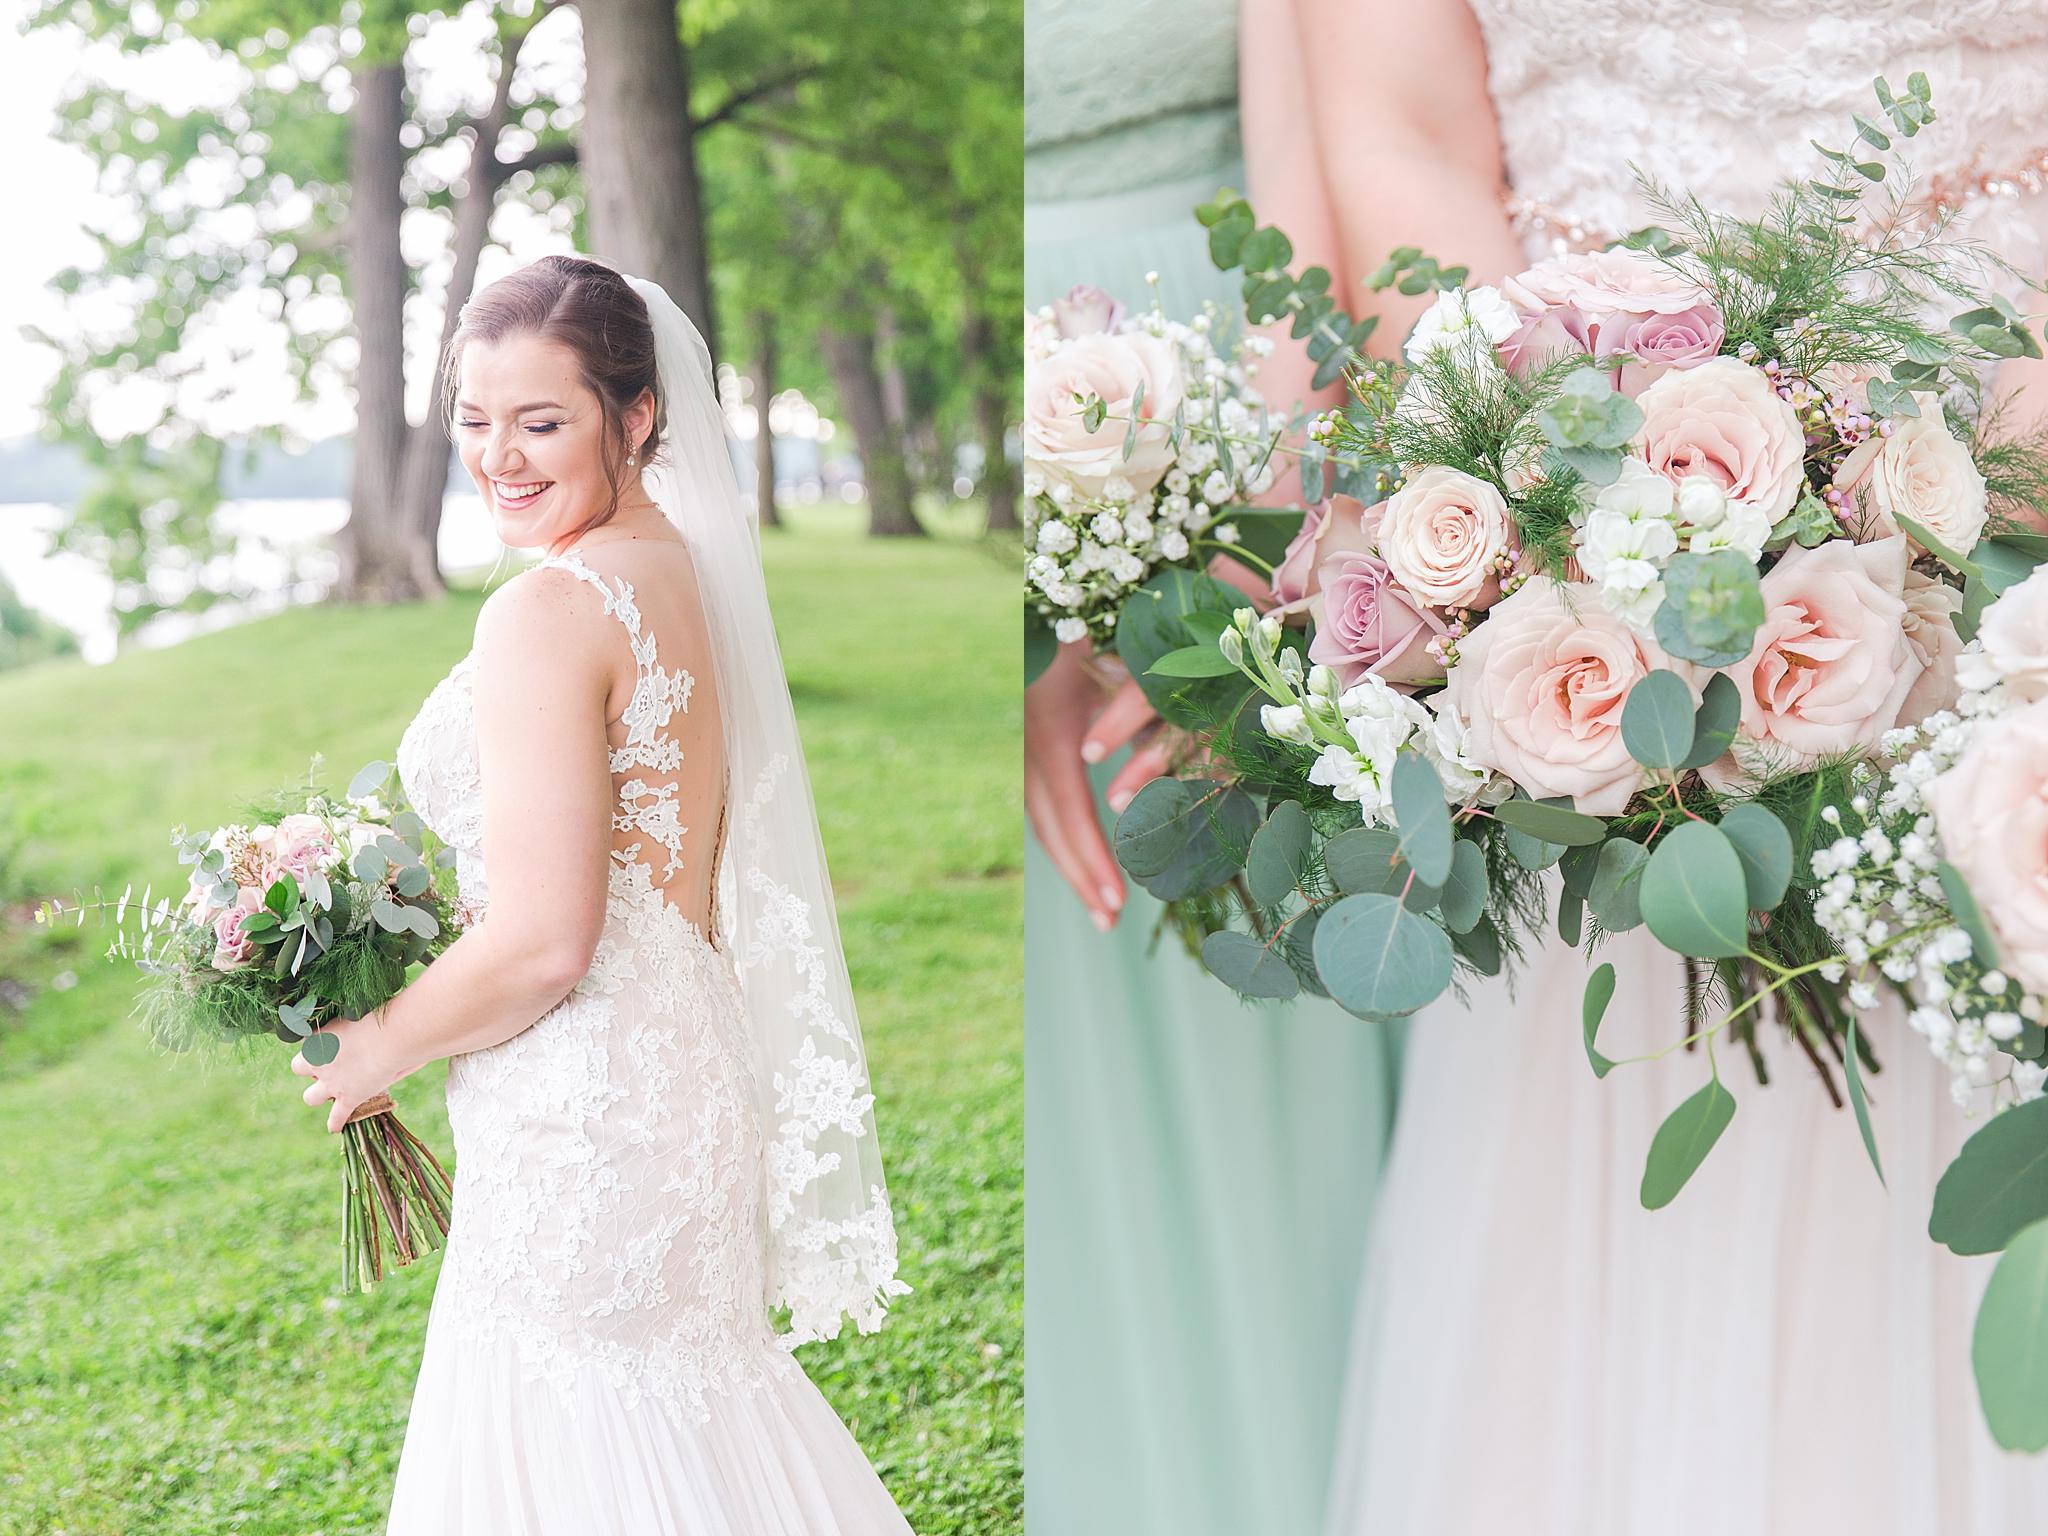 detroit-wedding-photographer-brownstown-event-center-wedding-photos-sam-josh-by-courtney-carolyn-photography_0024.jpg